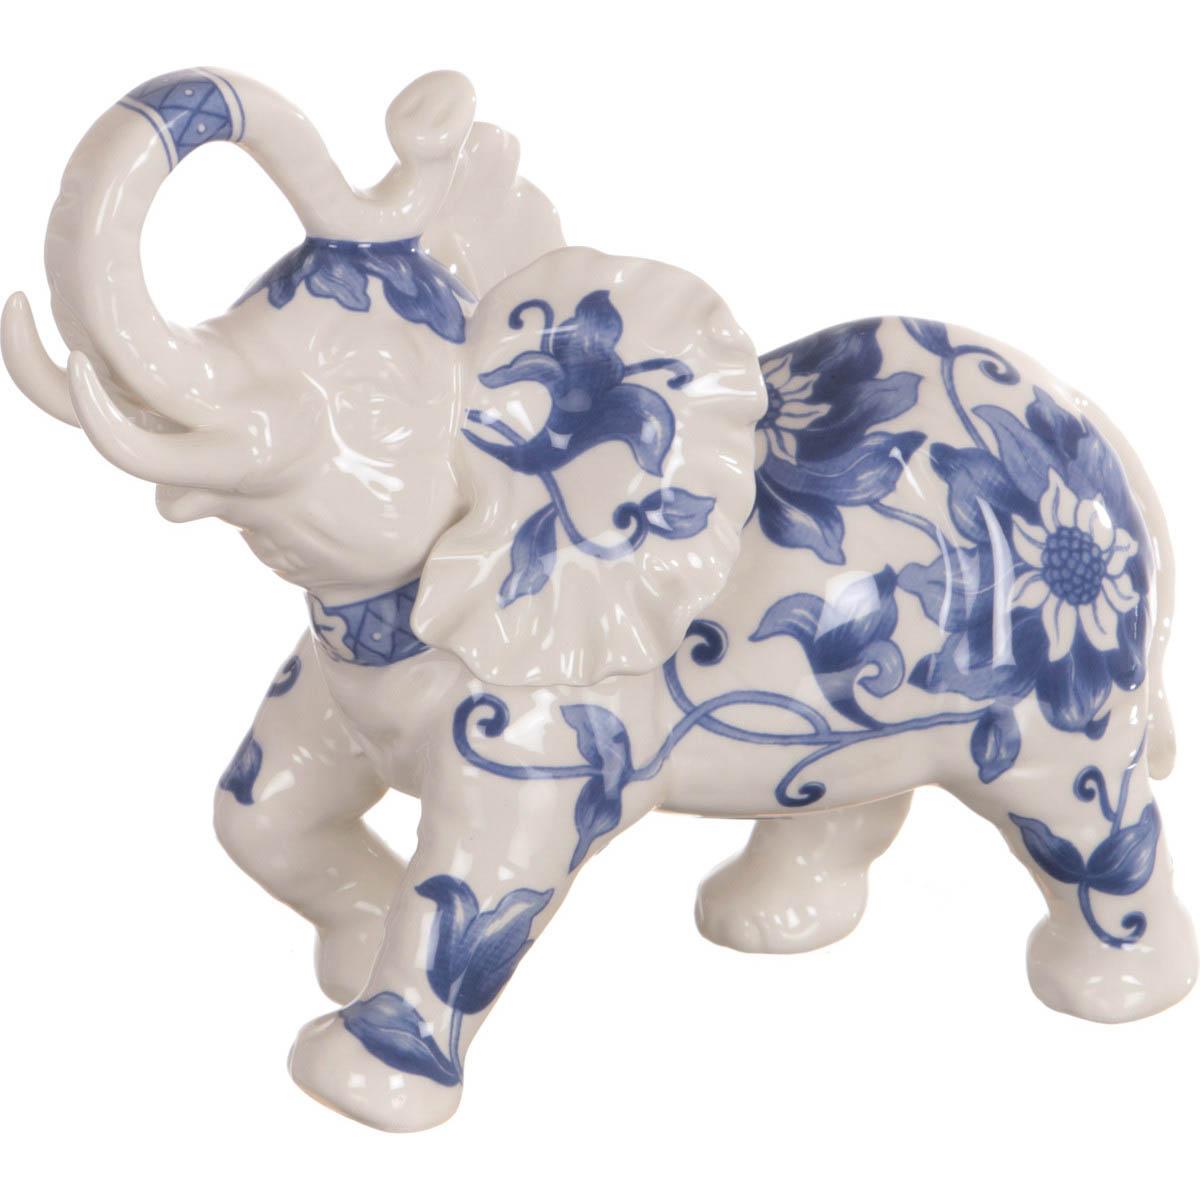 Купить Статуэтки и фигурки Arti-M, Фигурка Слон (8х15х18 см), Китай, Бежевый, Синий, Керамика